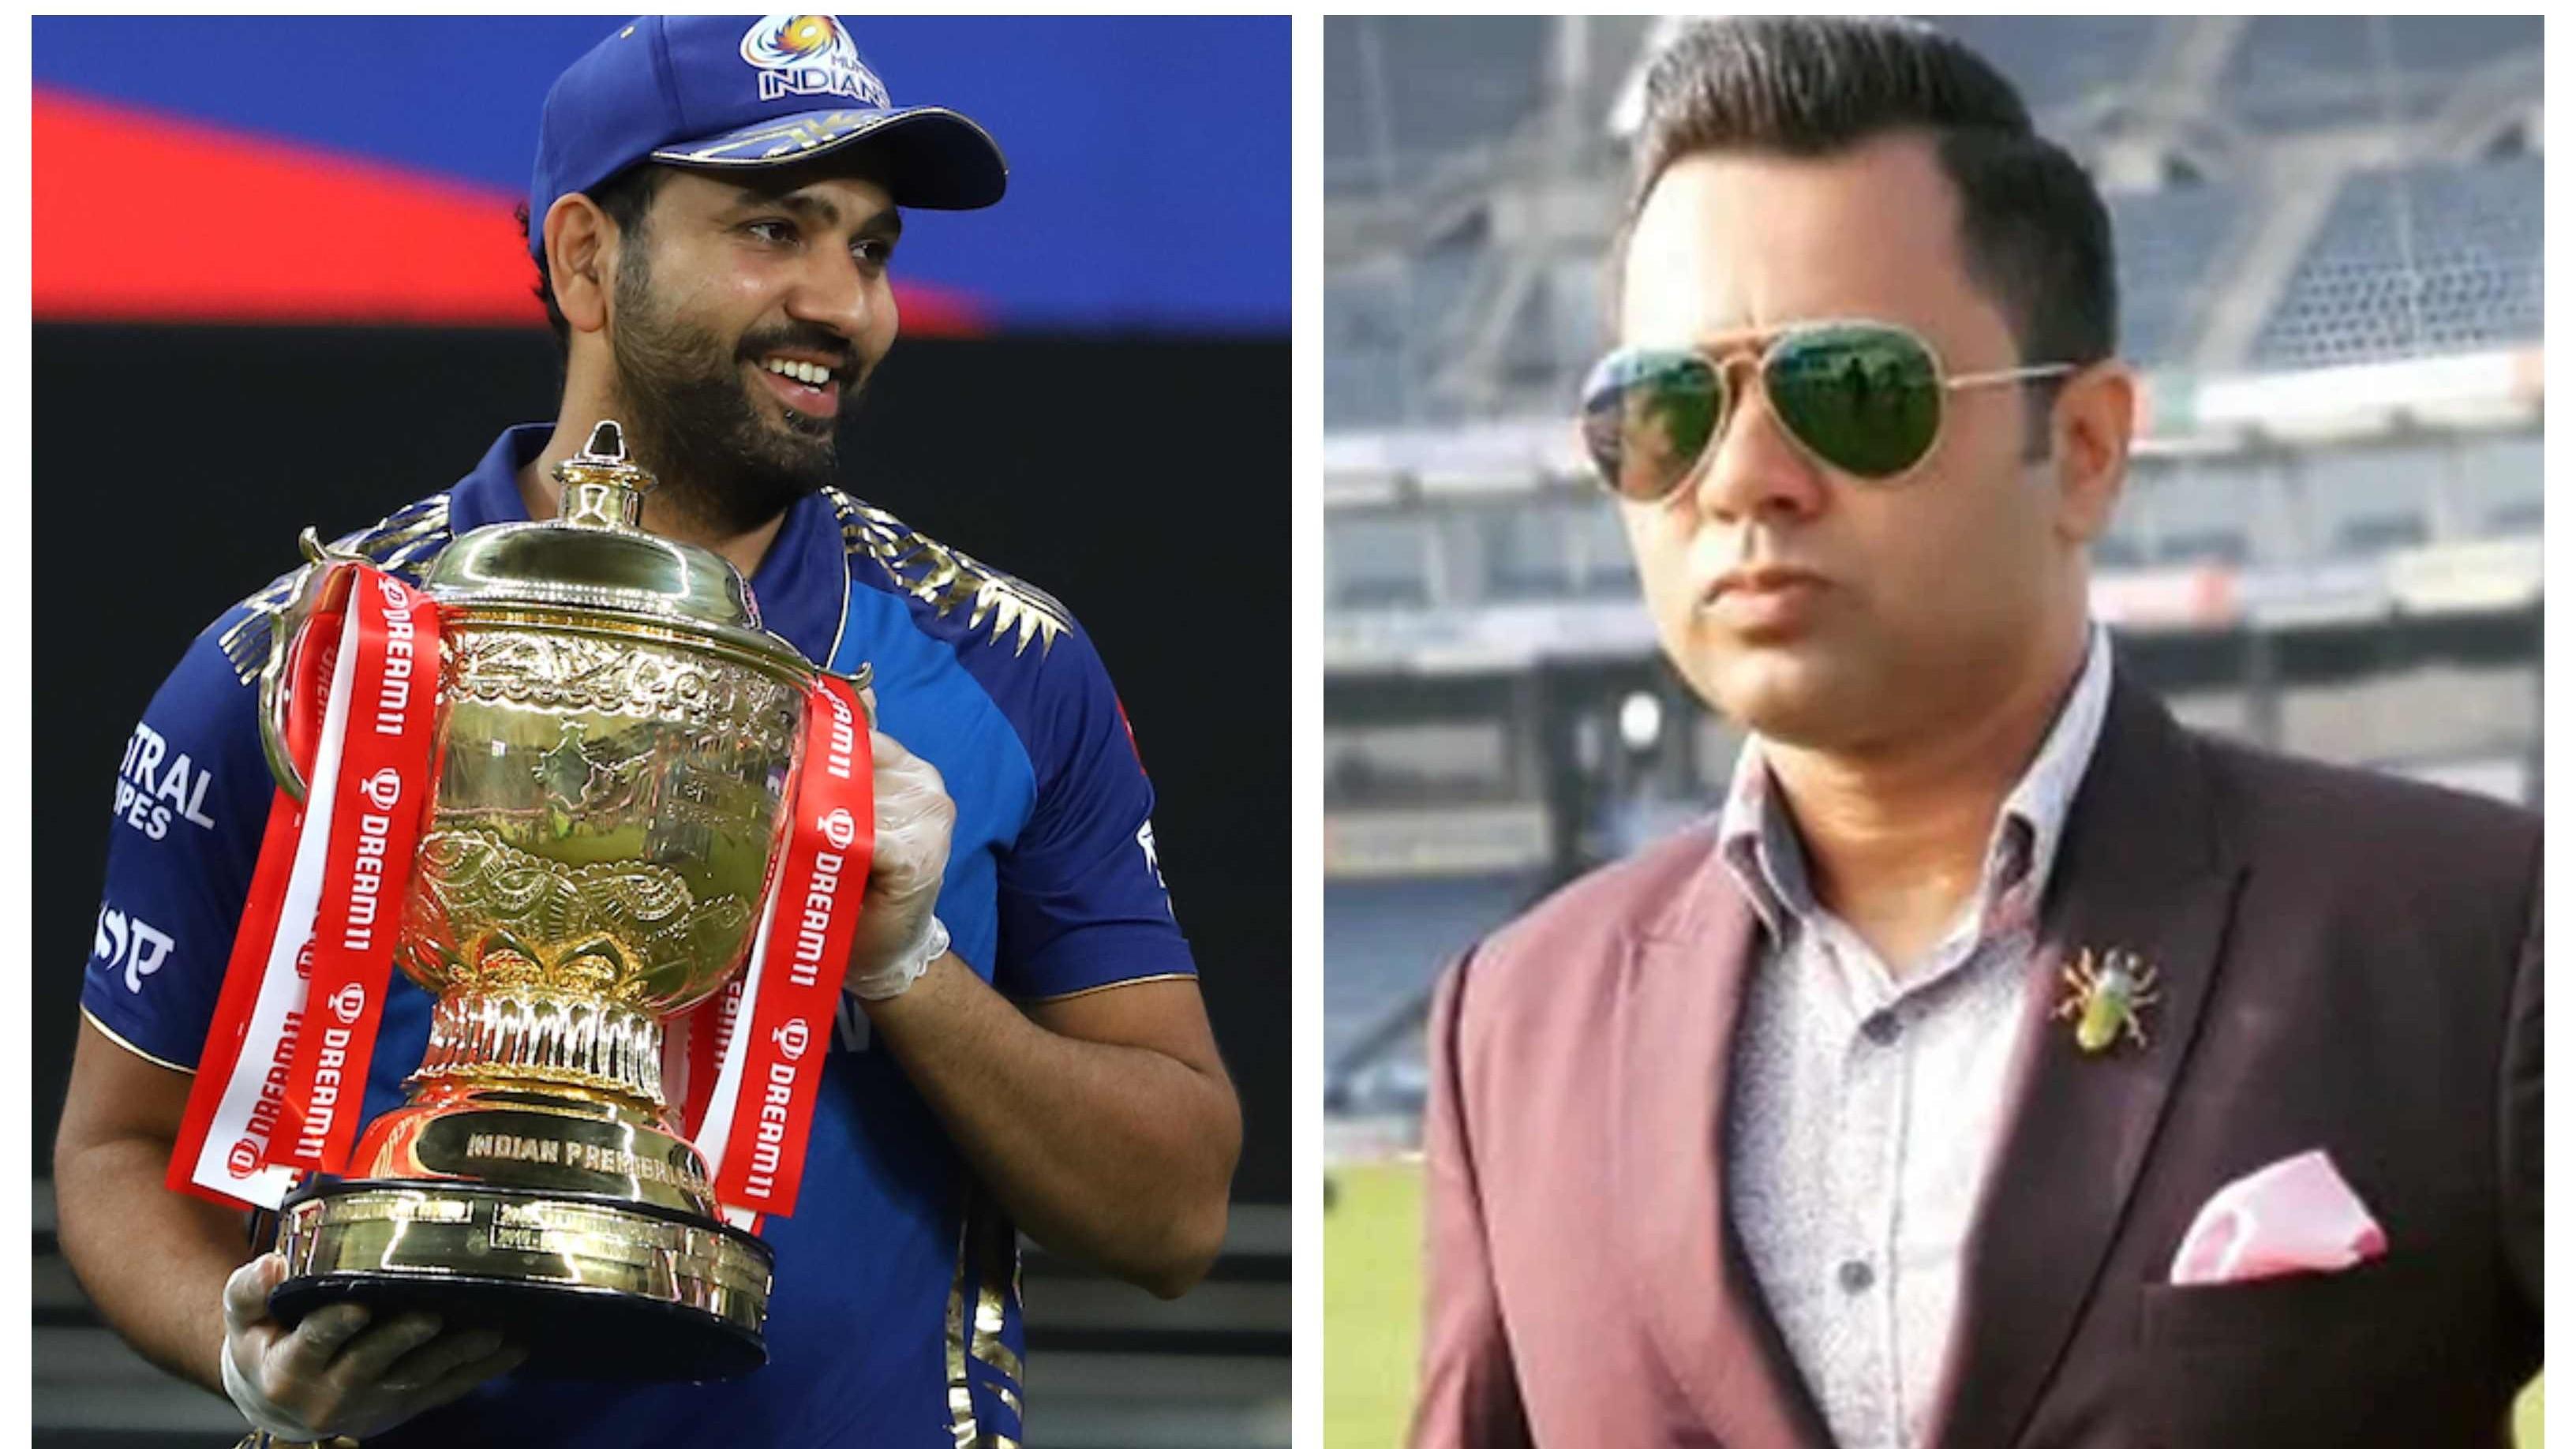 IPL 2020: Aakash Chopra wonders if Rohit Sharma would have won five IPL titles by leading RCB